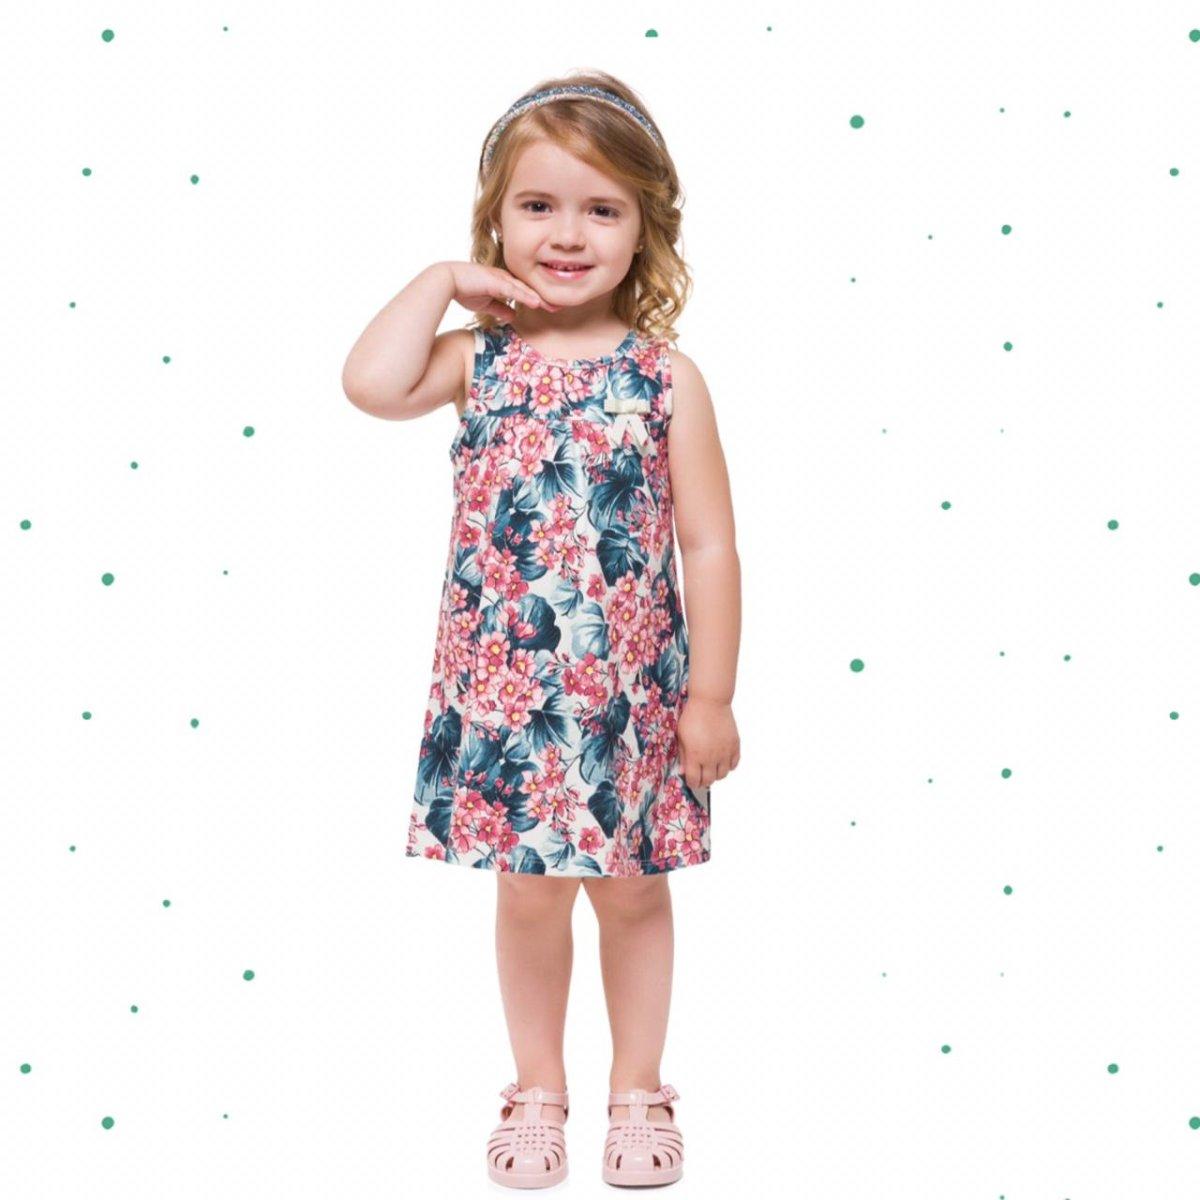 Vestido Infantil Milon em Cotton 4 Estampado